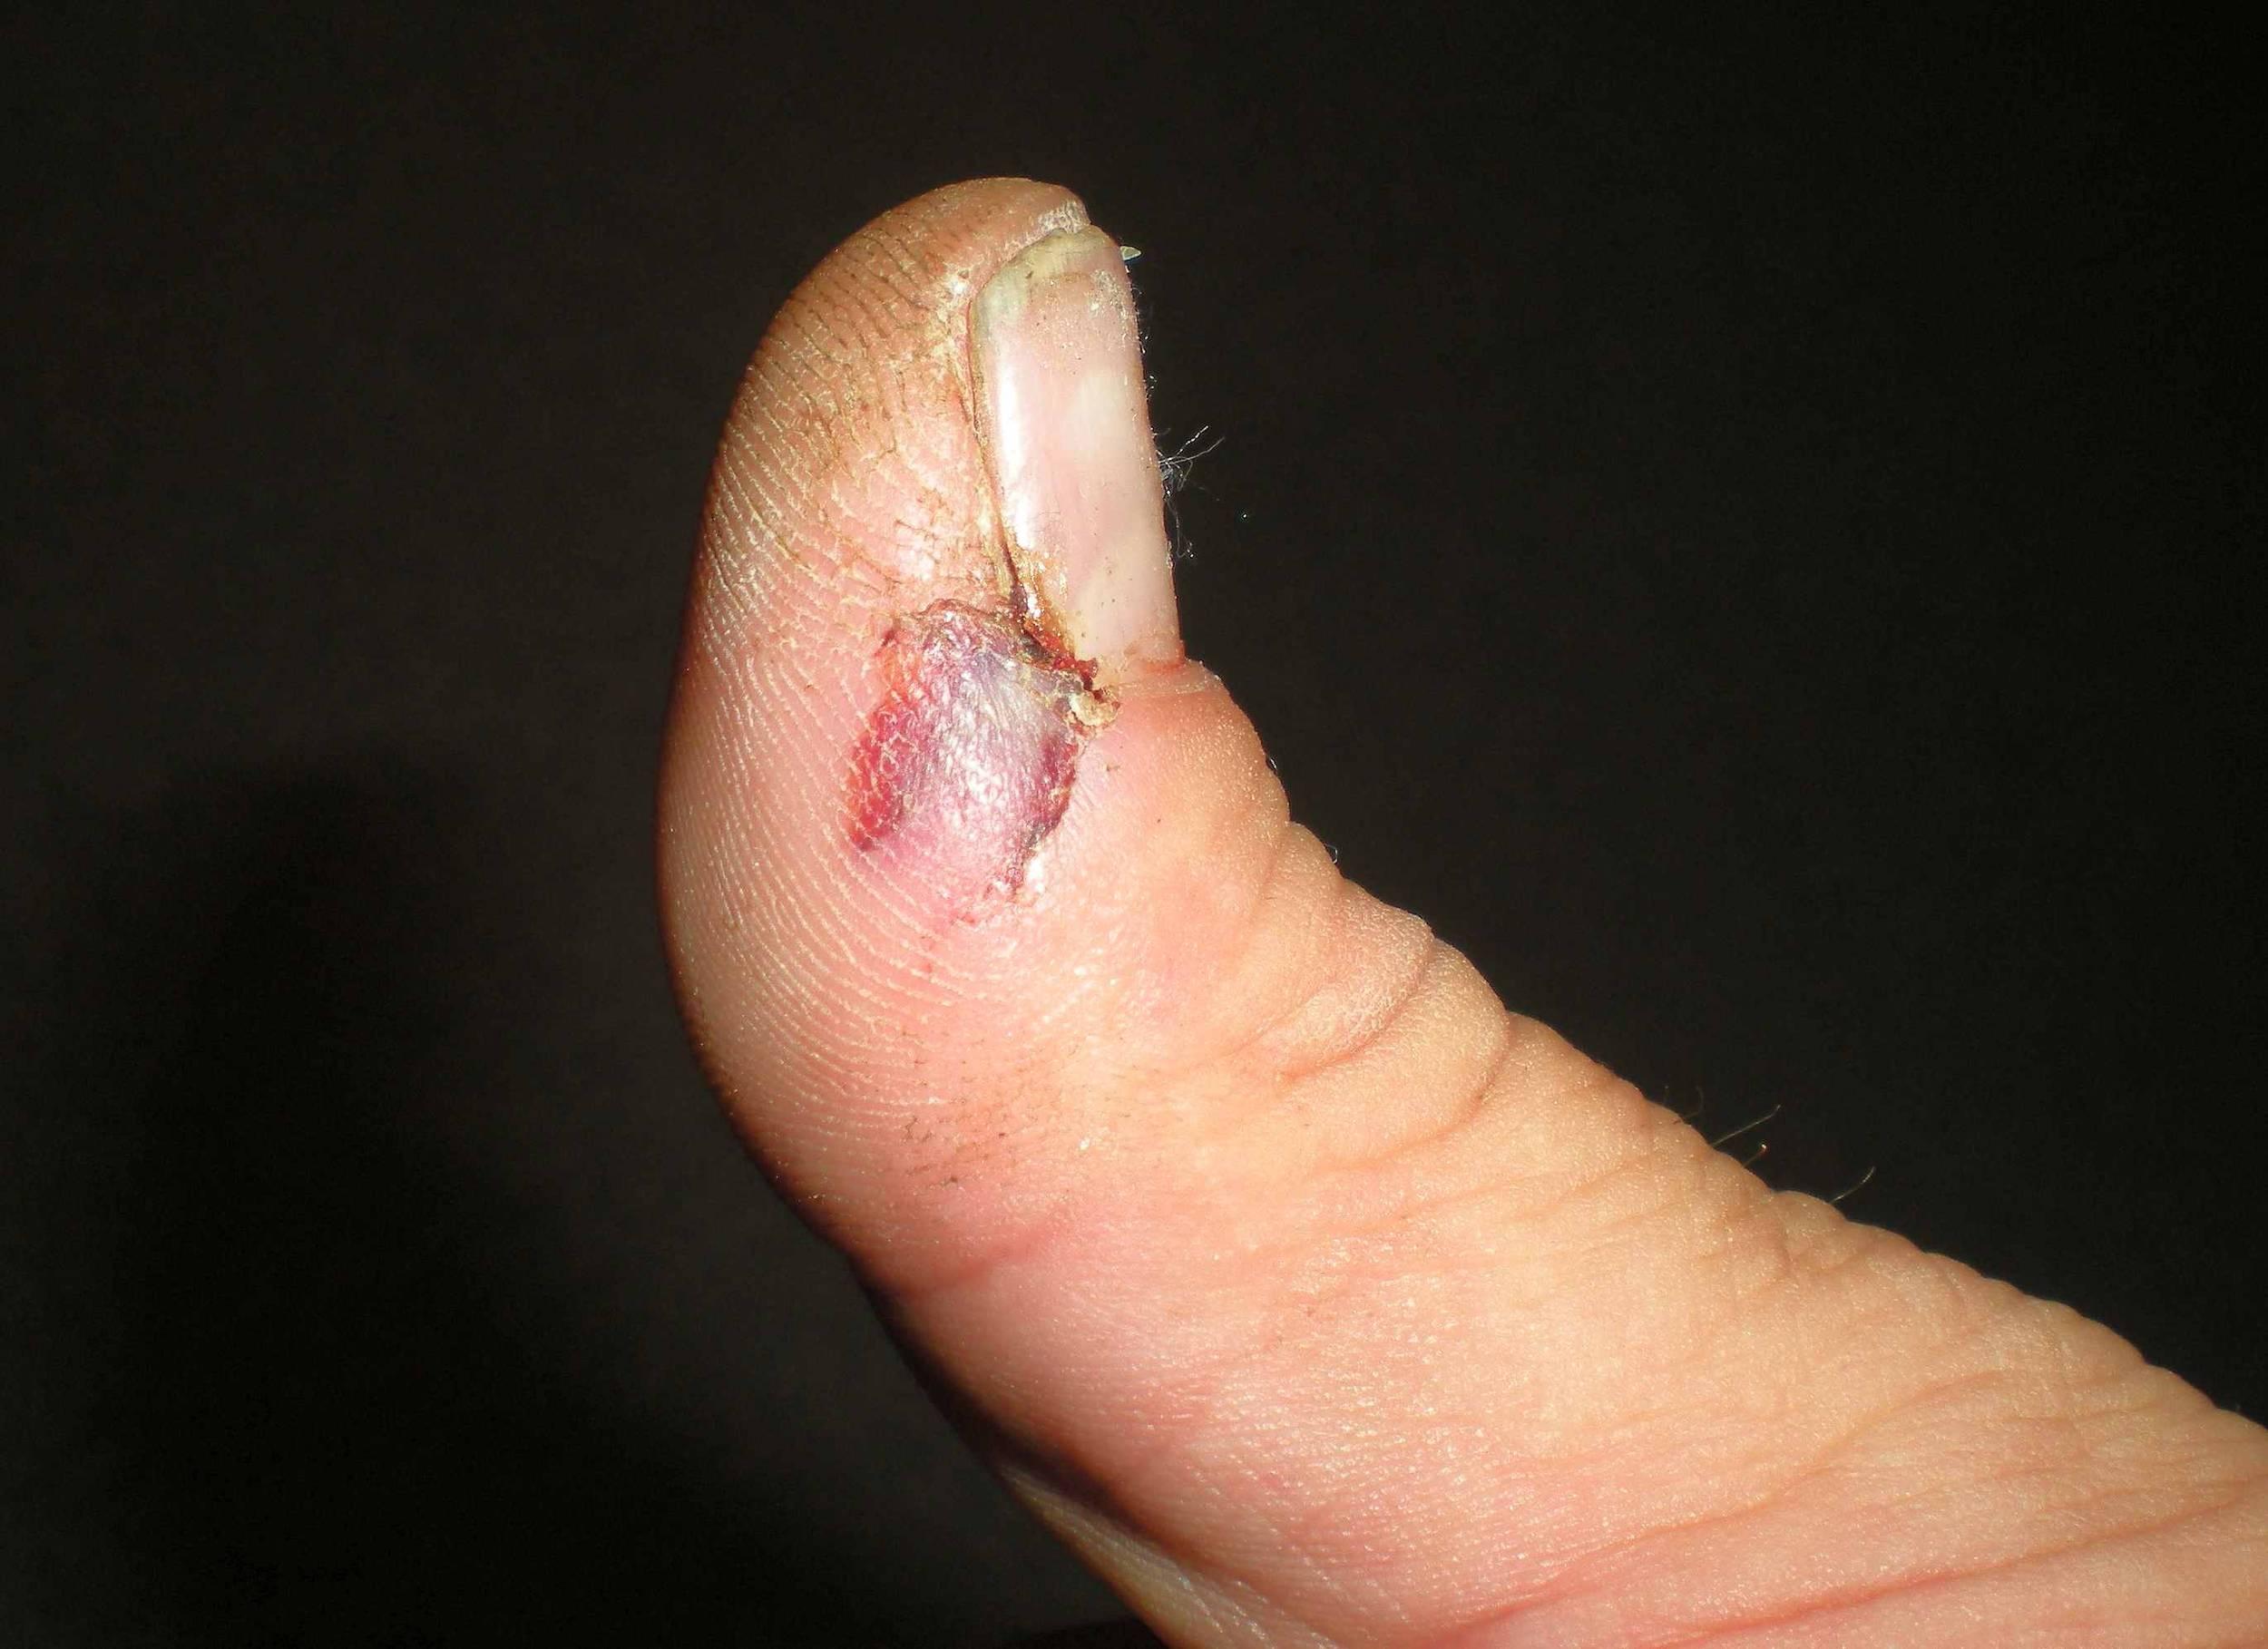 Smashed_thumb.jpg